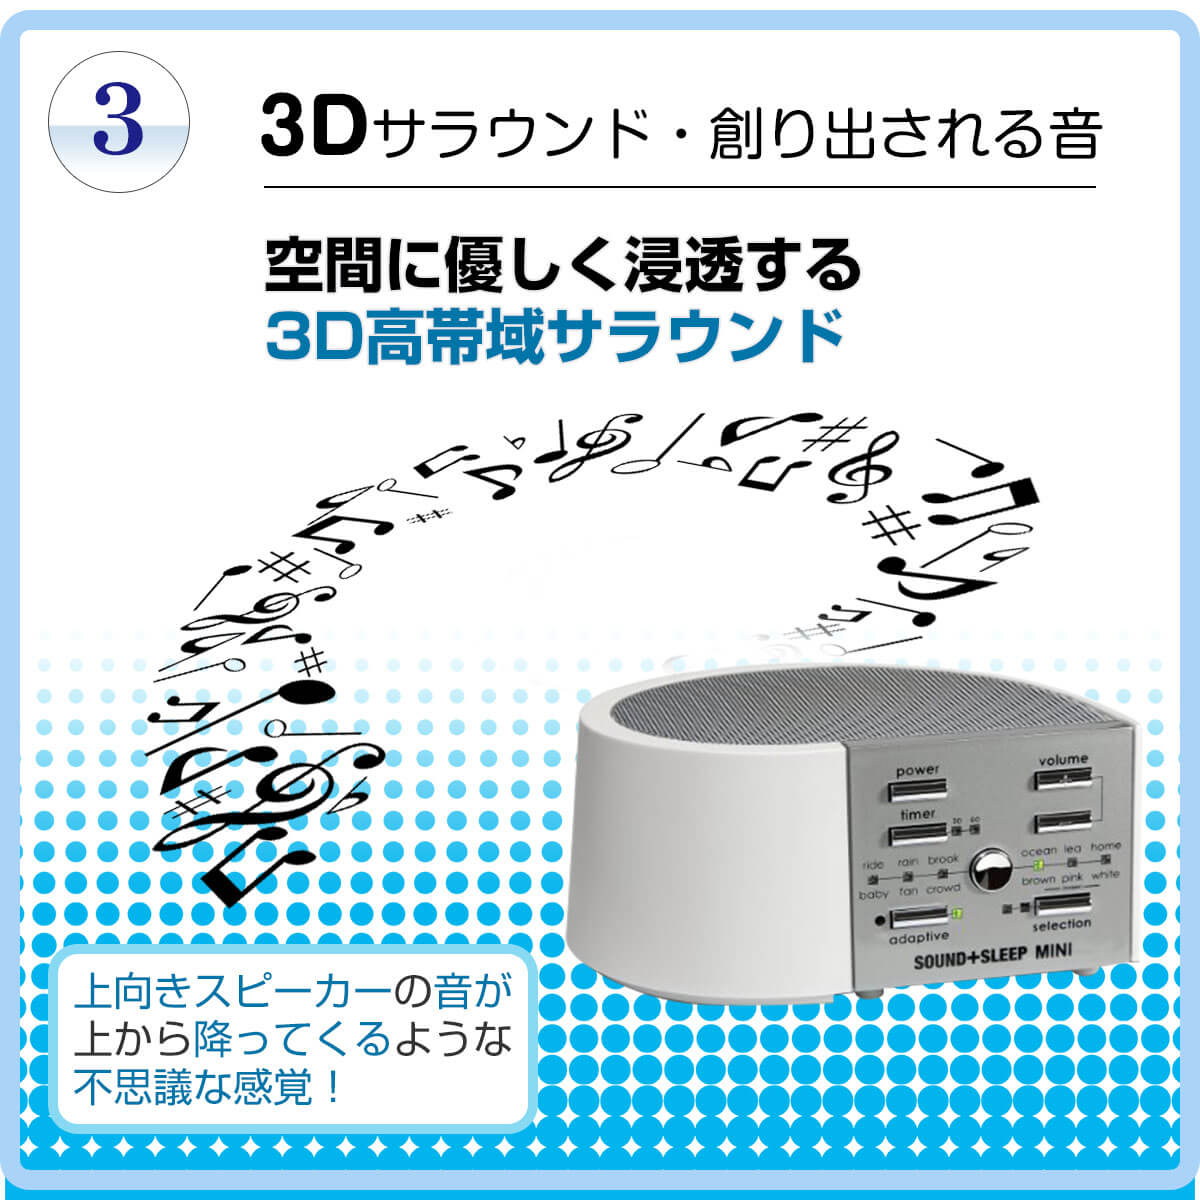 3D高帯域サラウンド